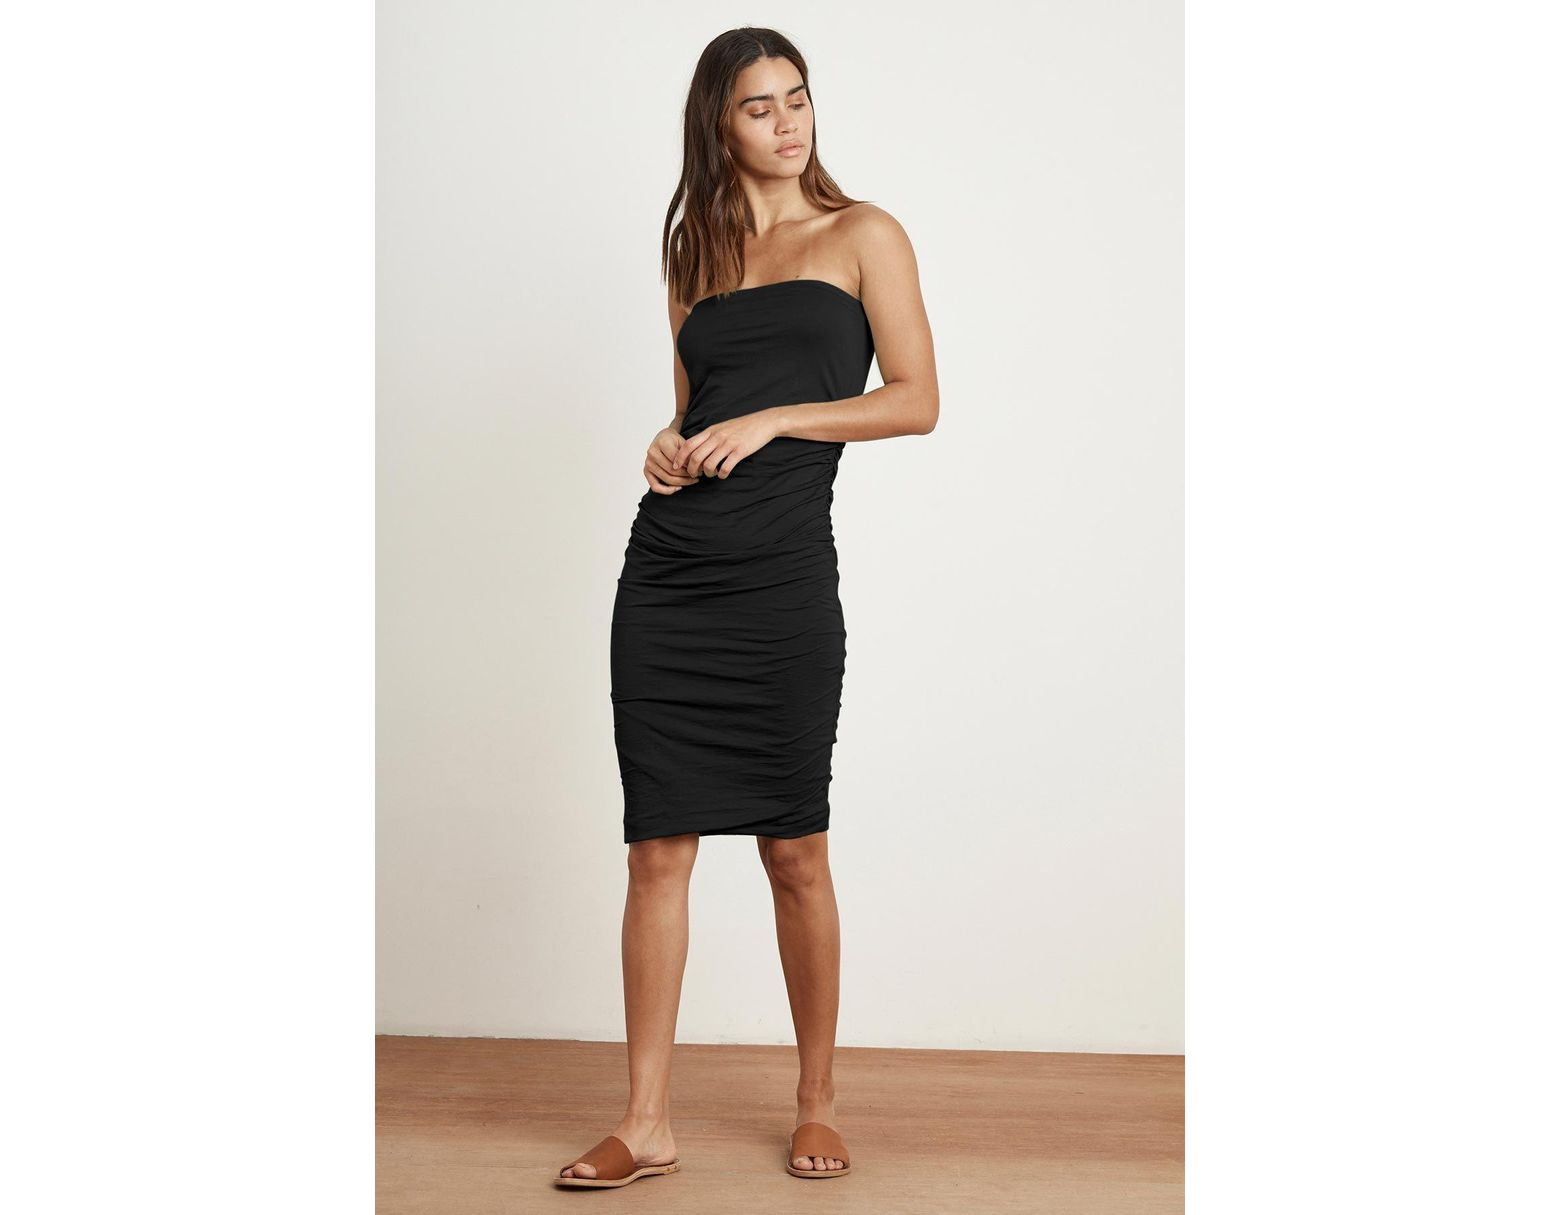 Black Danna Women's Shirred Whisper Gauzy Dress Strapless N0ynvOm8w